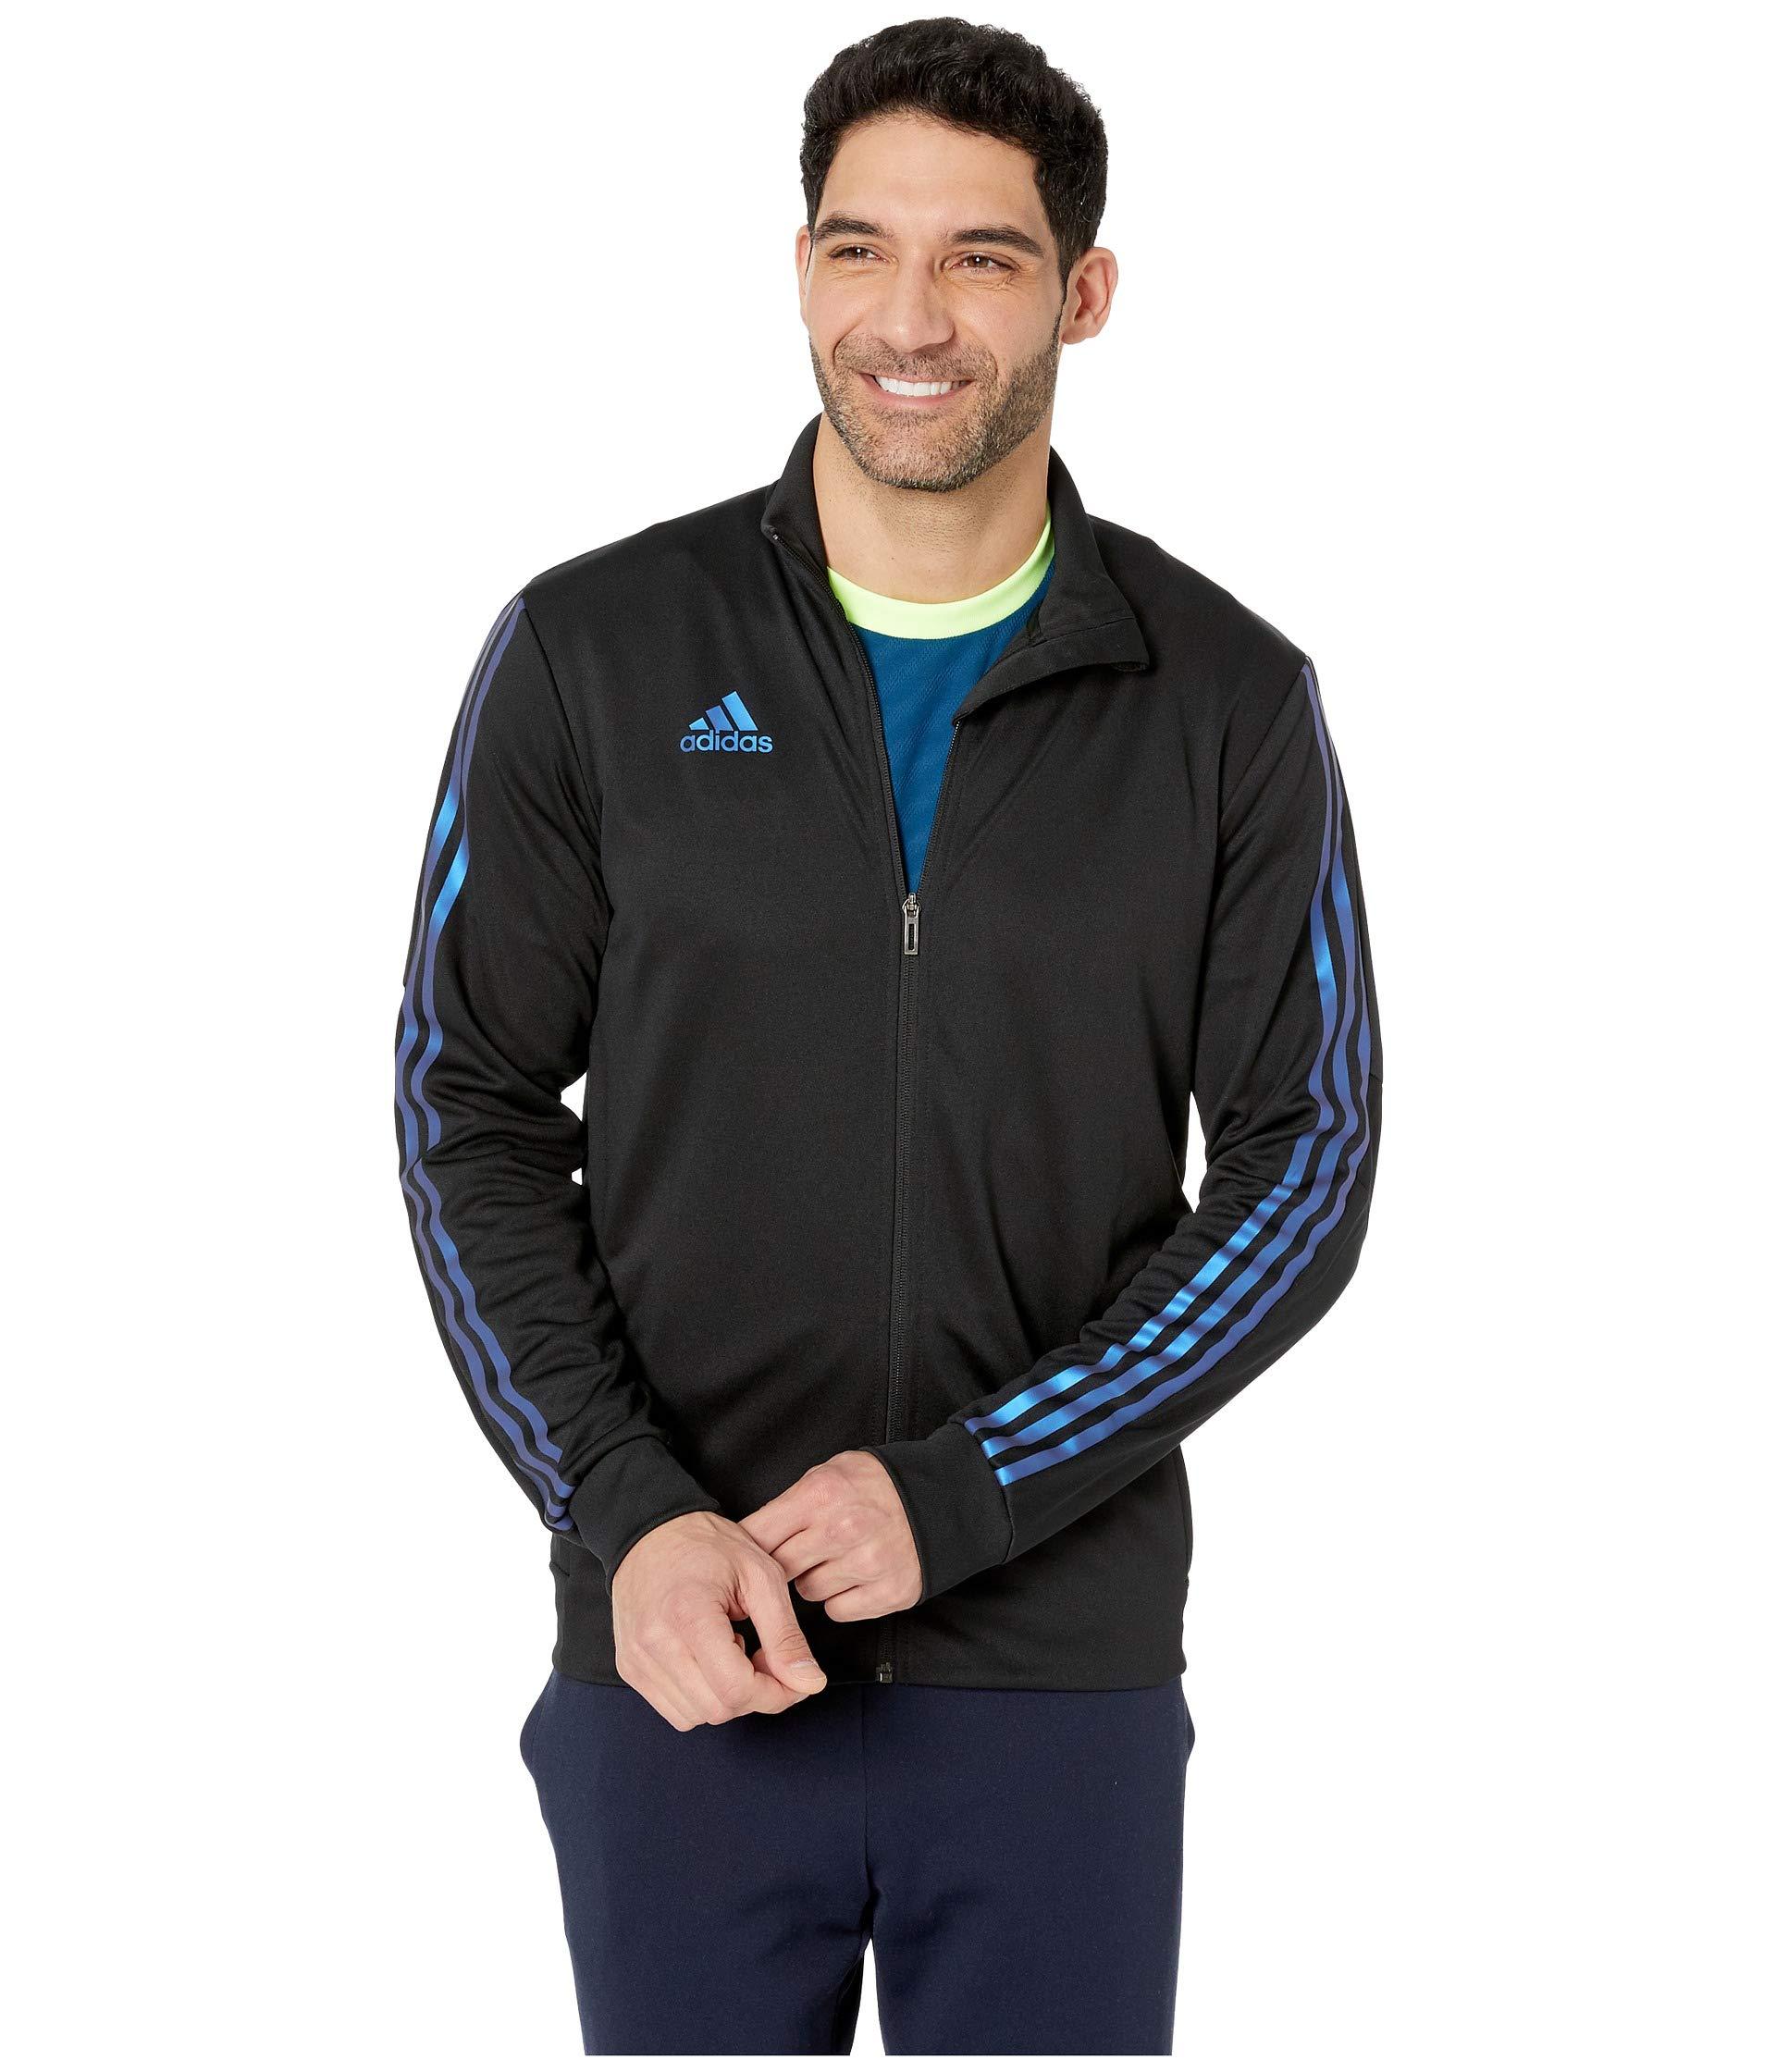 adidas Men's Alphaskin Tiro Training Jacket, Black/Blue Pearl Essence, XX-Large by adidas